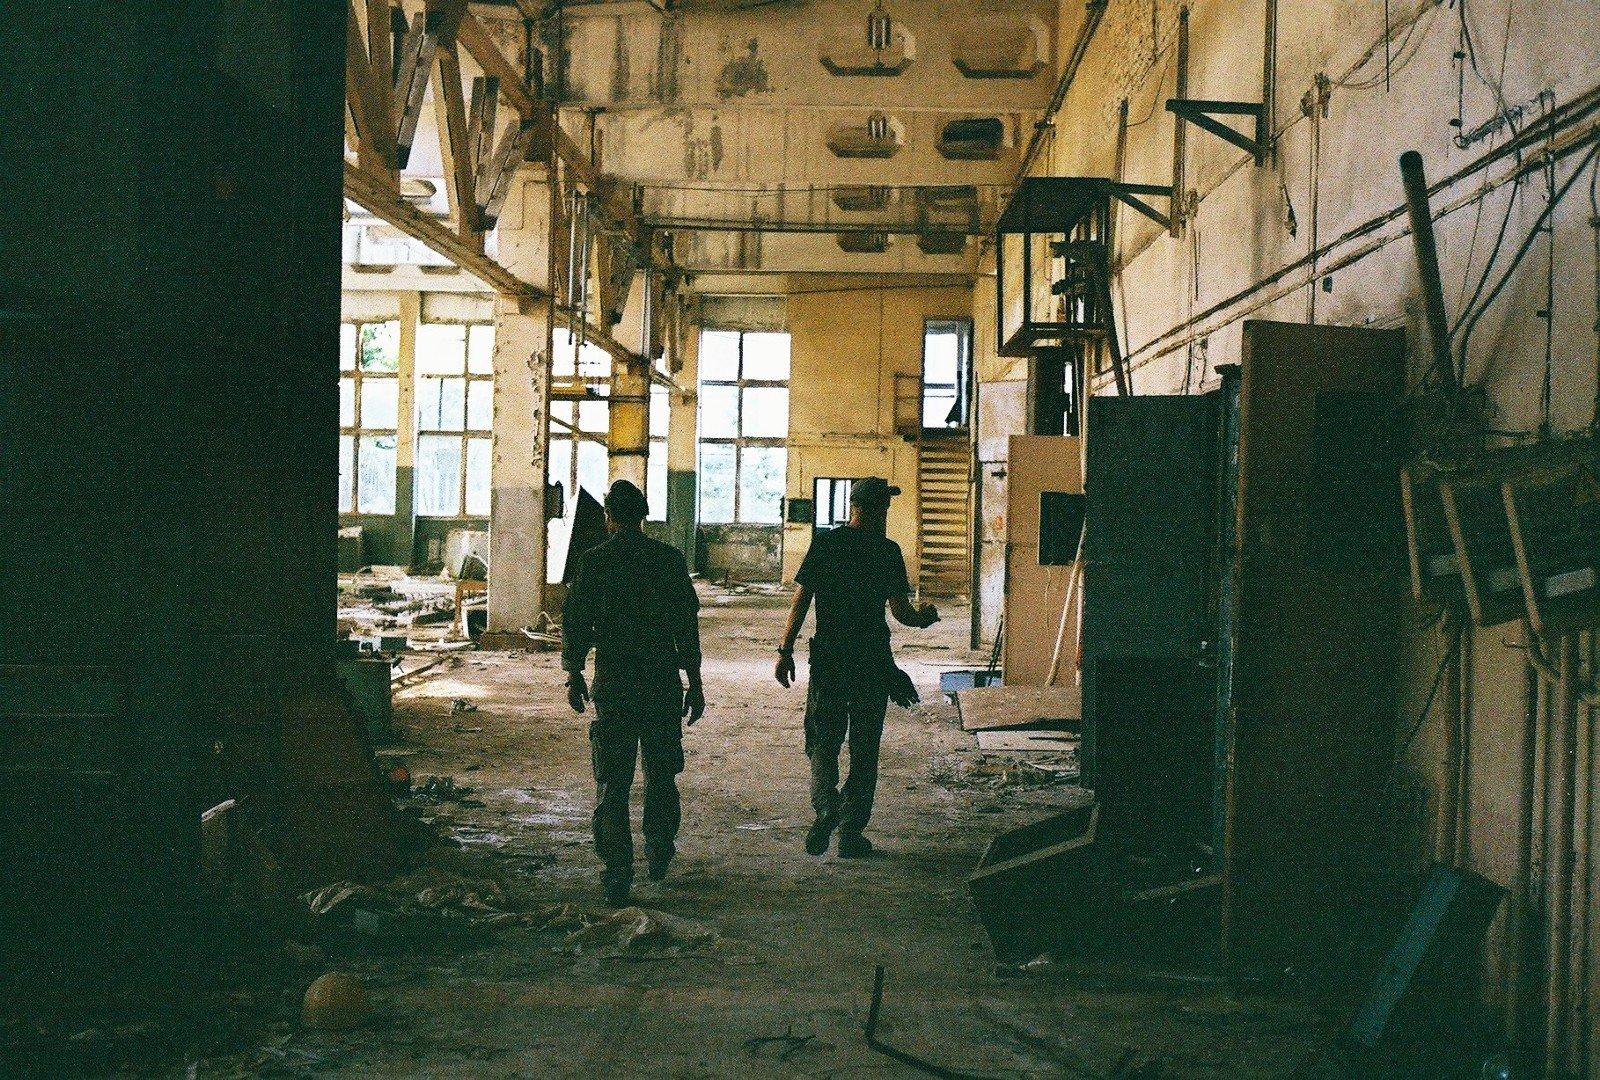 snaeking-into-chernobyl2 SNEAKING INTO CHERNOBYL